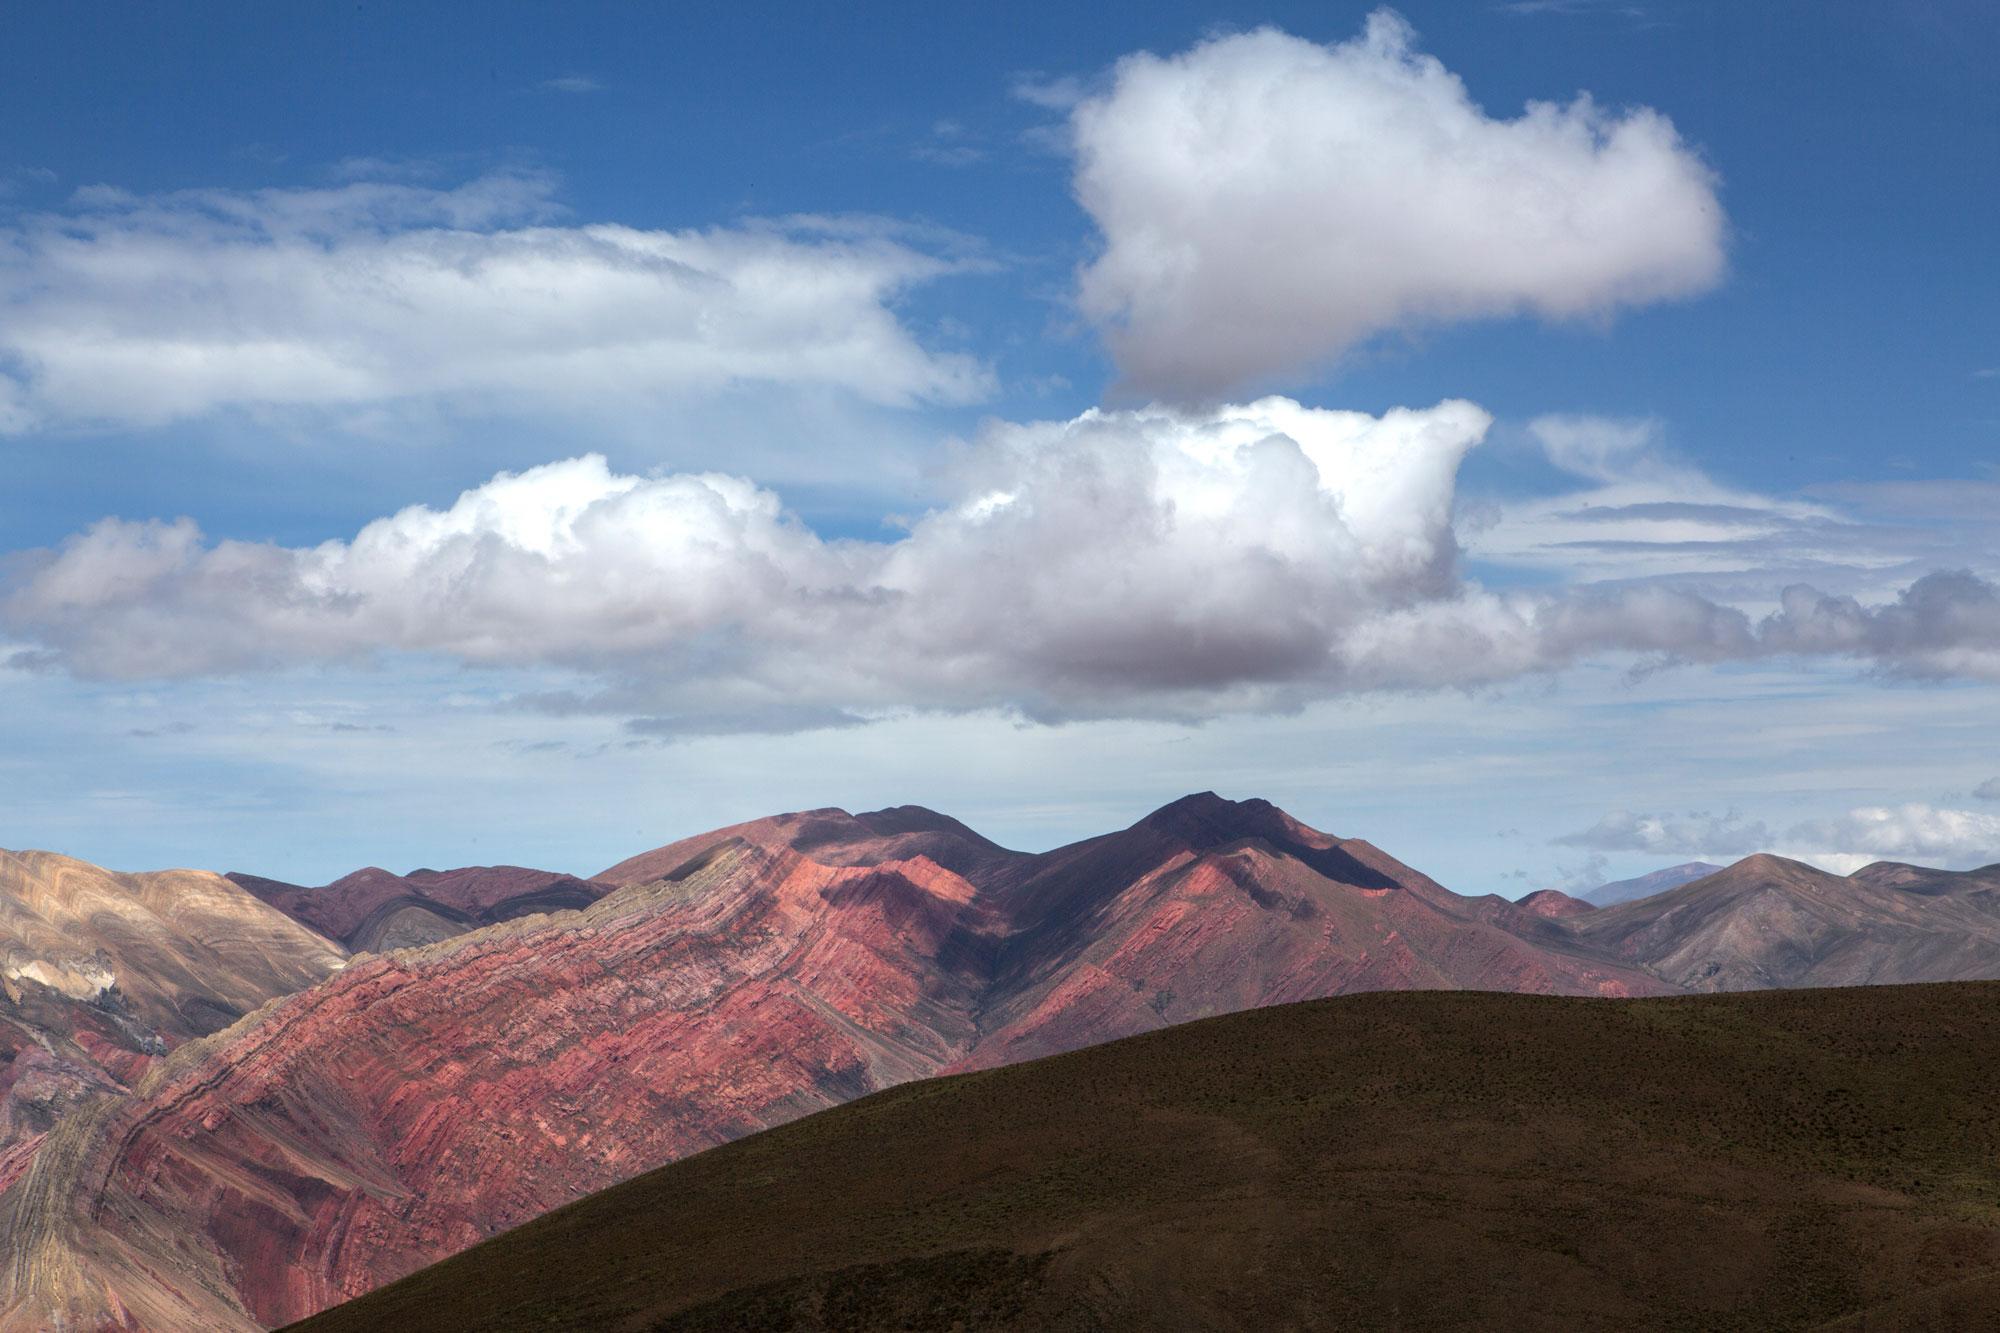 montagne cielo nuvole